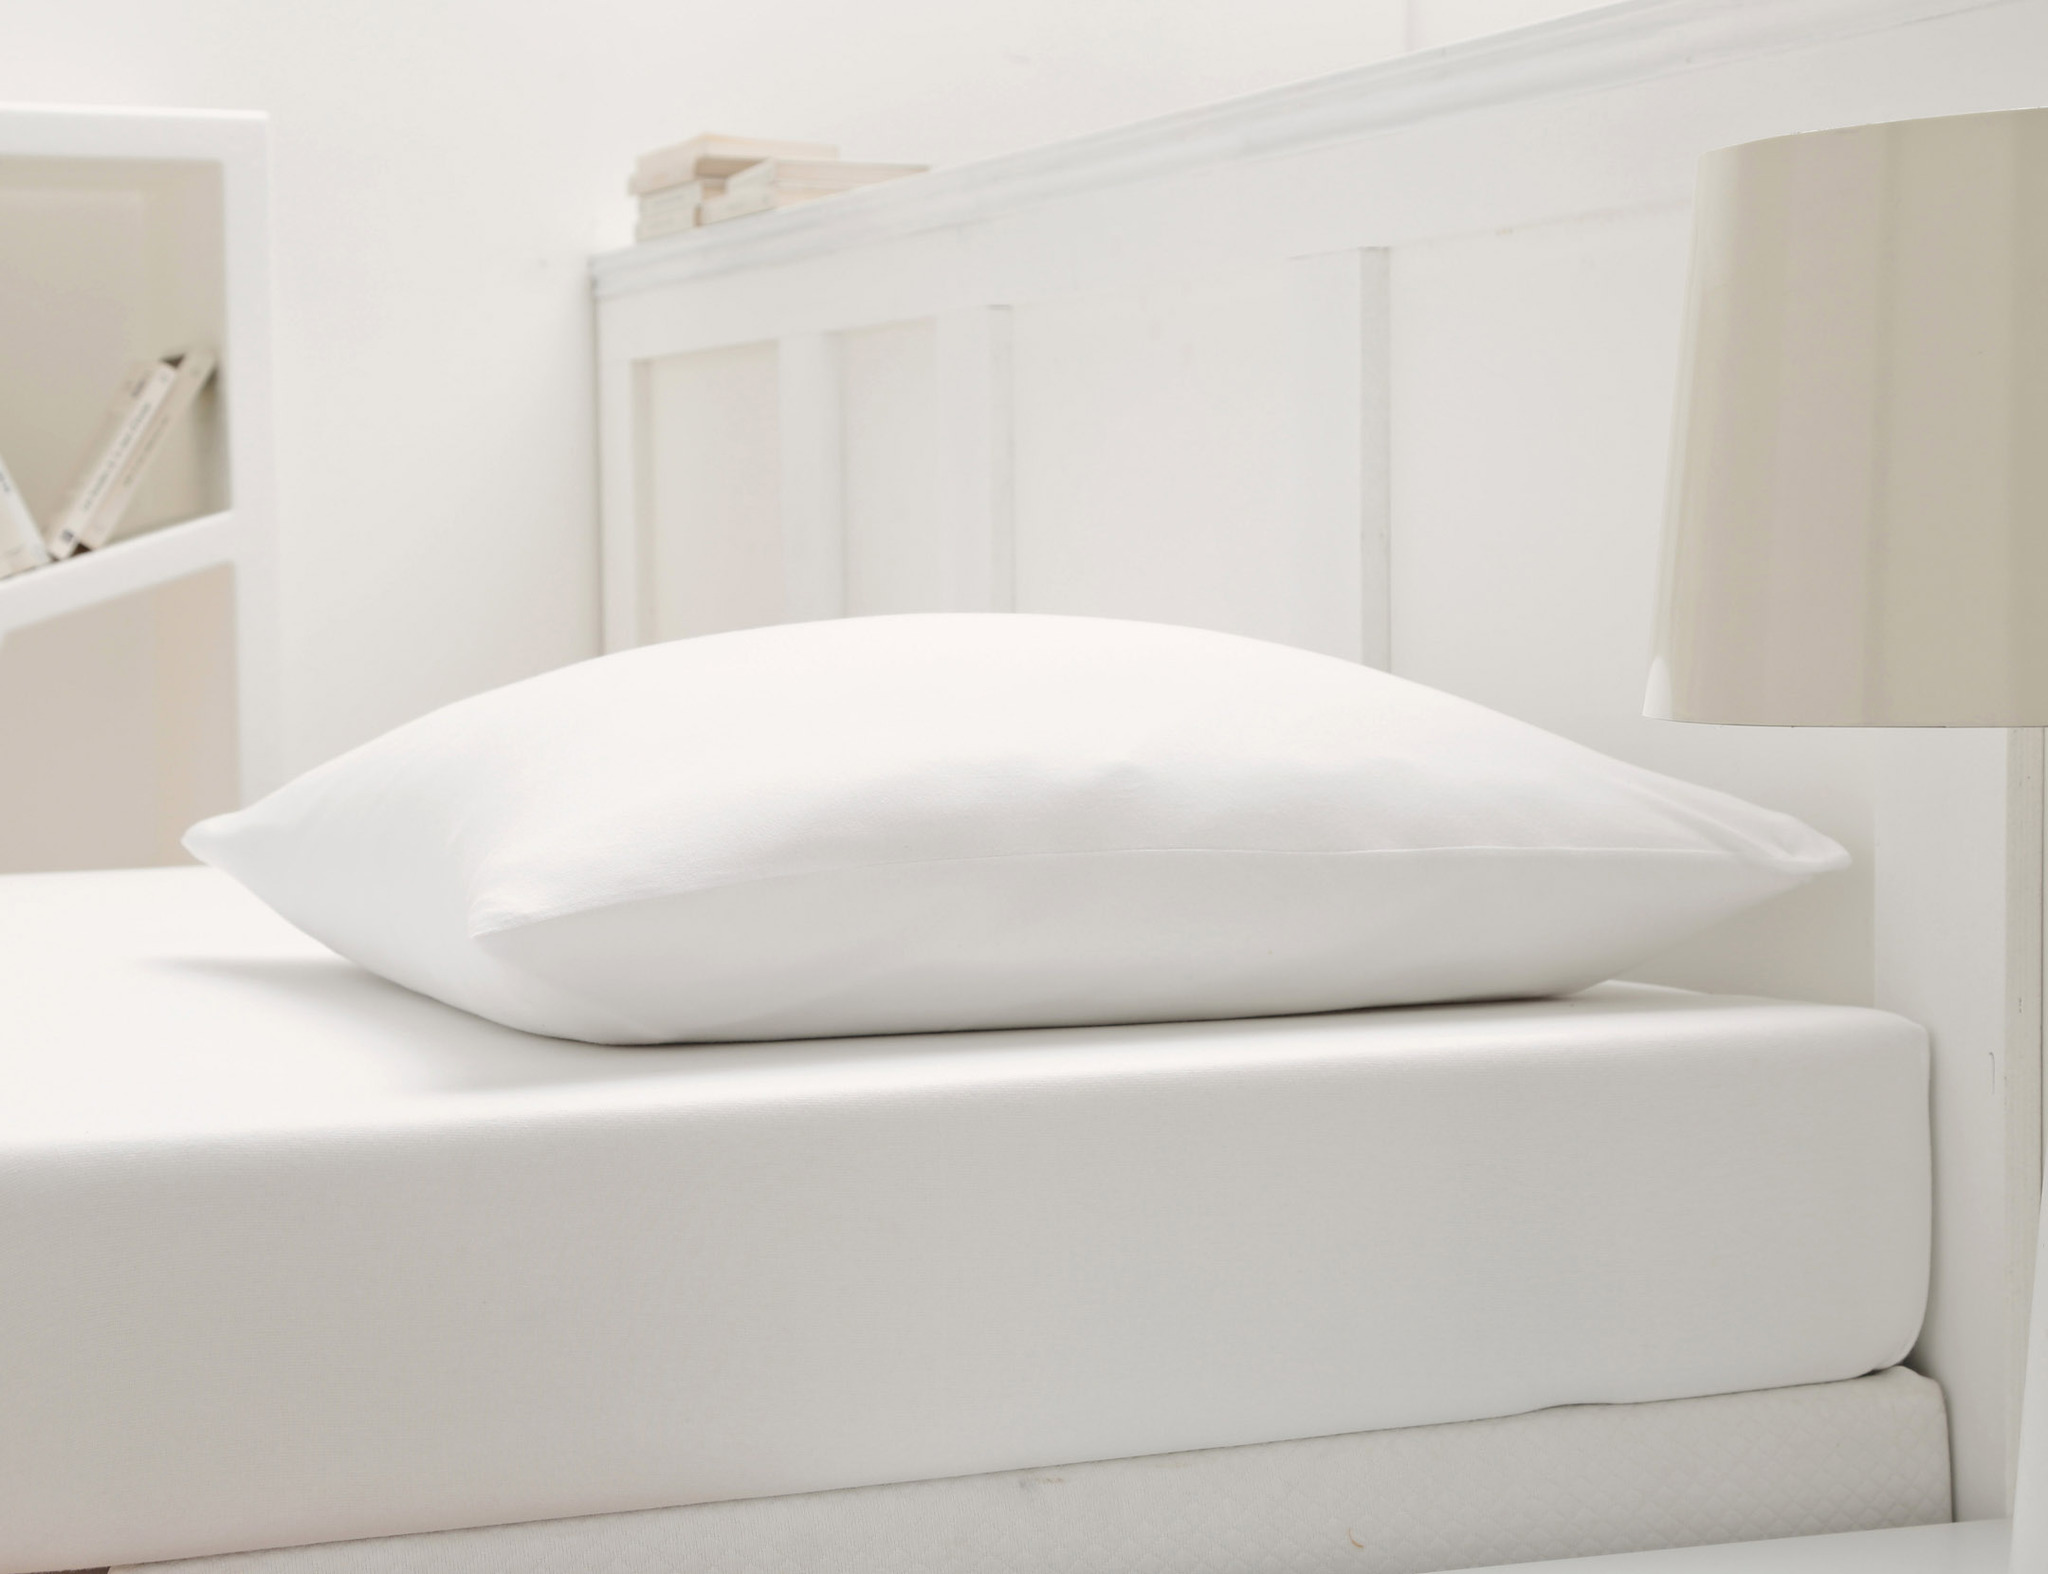 На резинке Простыня на резинке 180x200 Blanc des Vosges джерси белая prostynya-na-rezinke-180x200-blanc-des-vosges-dzhersi-belaya-frantsiya.jpg